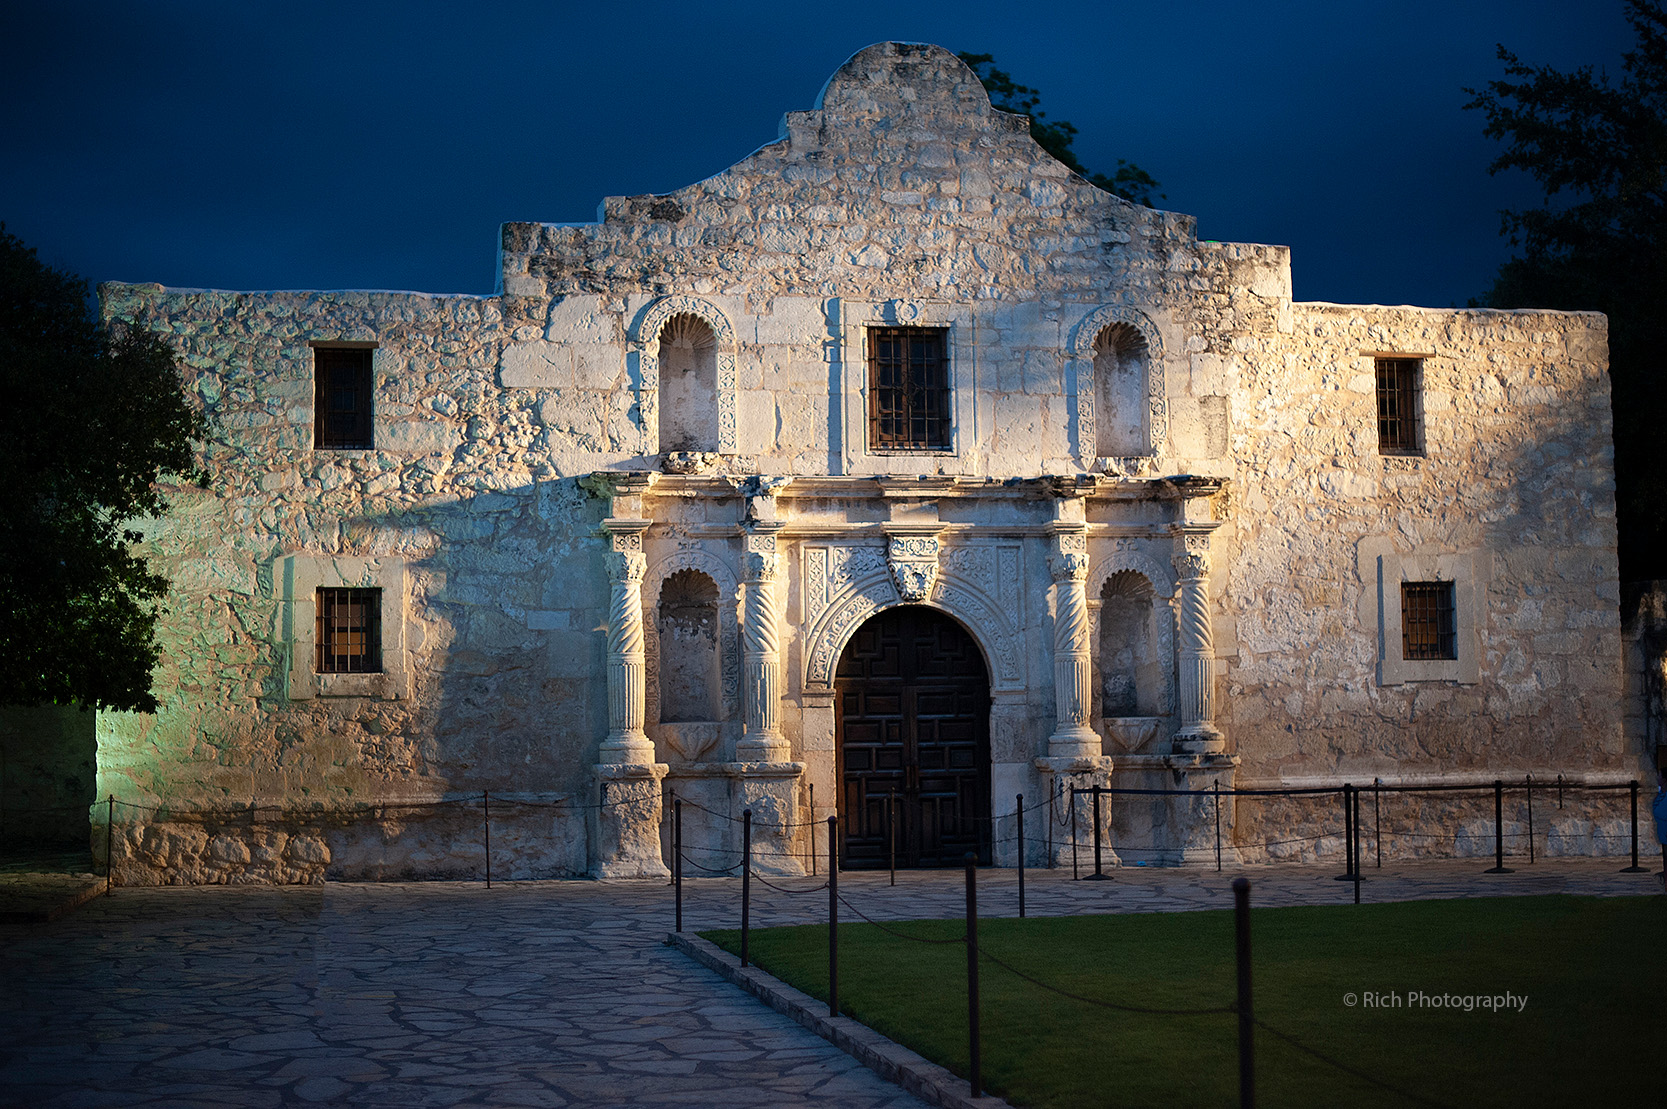 Alamo DSC_4942 copy.jpg